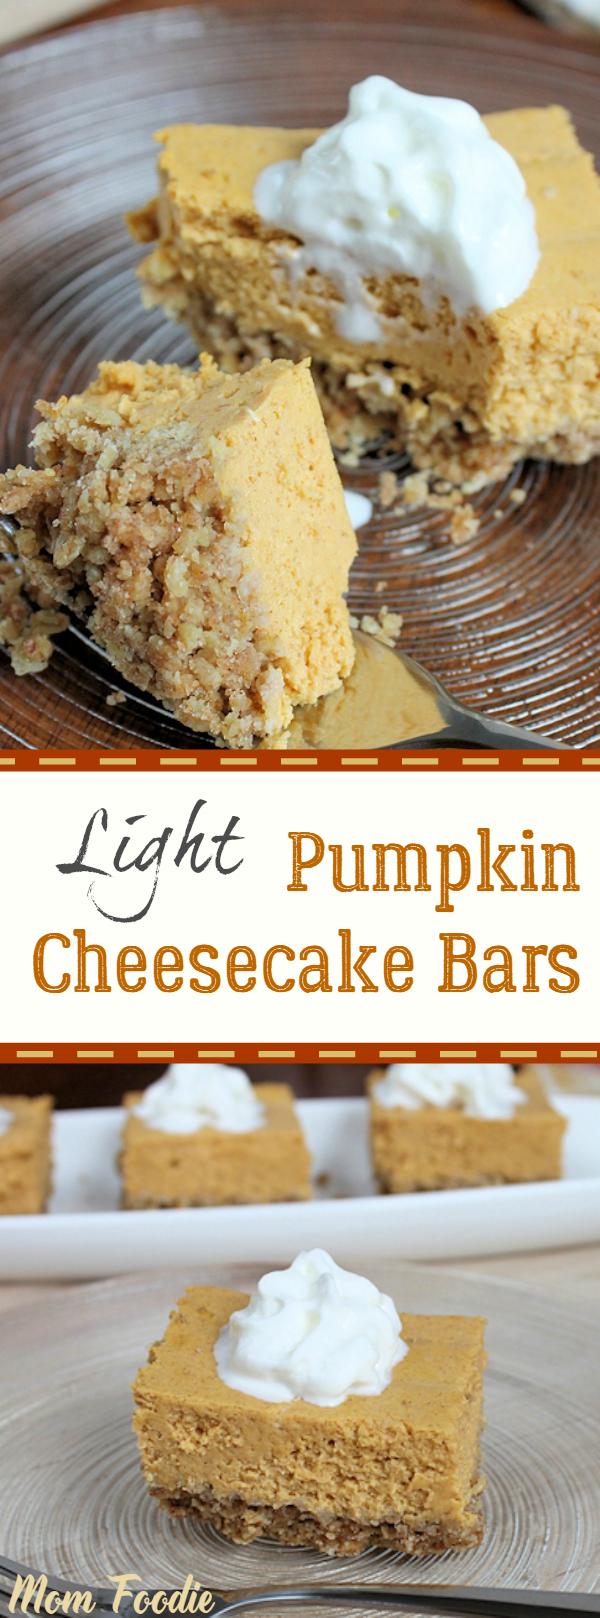 Light Pumpkin Cheesecake Recipe